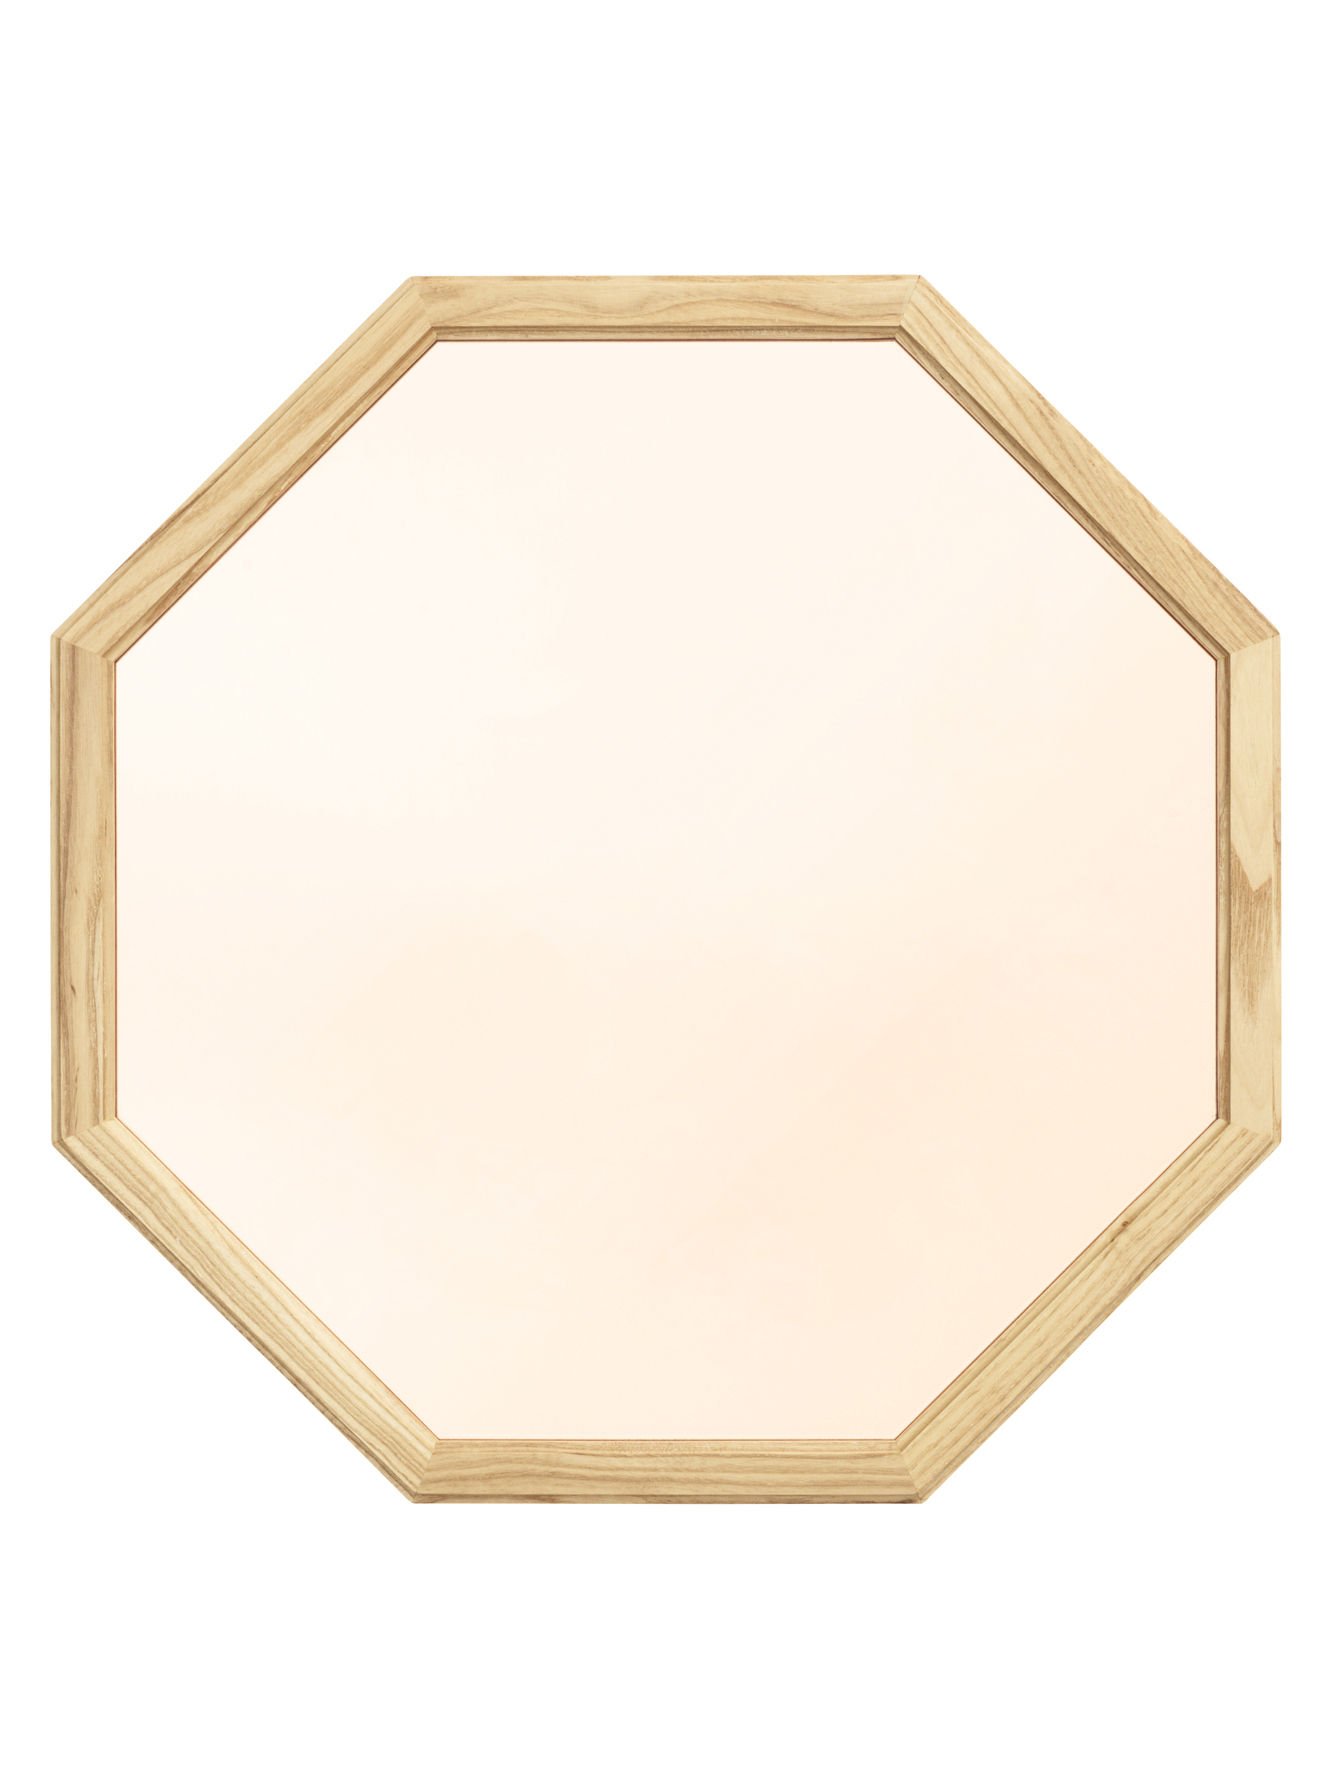 Déco - Miroirs - Miroir mural Lust   Medium / L 50 x H 50 cm - Normann Copenhagen - Medium / Or & chêne - Chêne naturel, Verre teinté